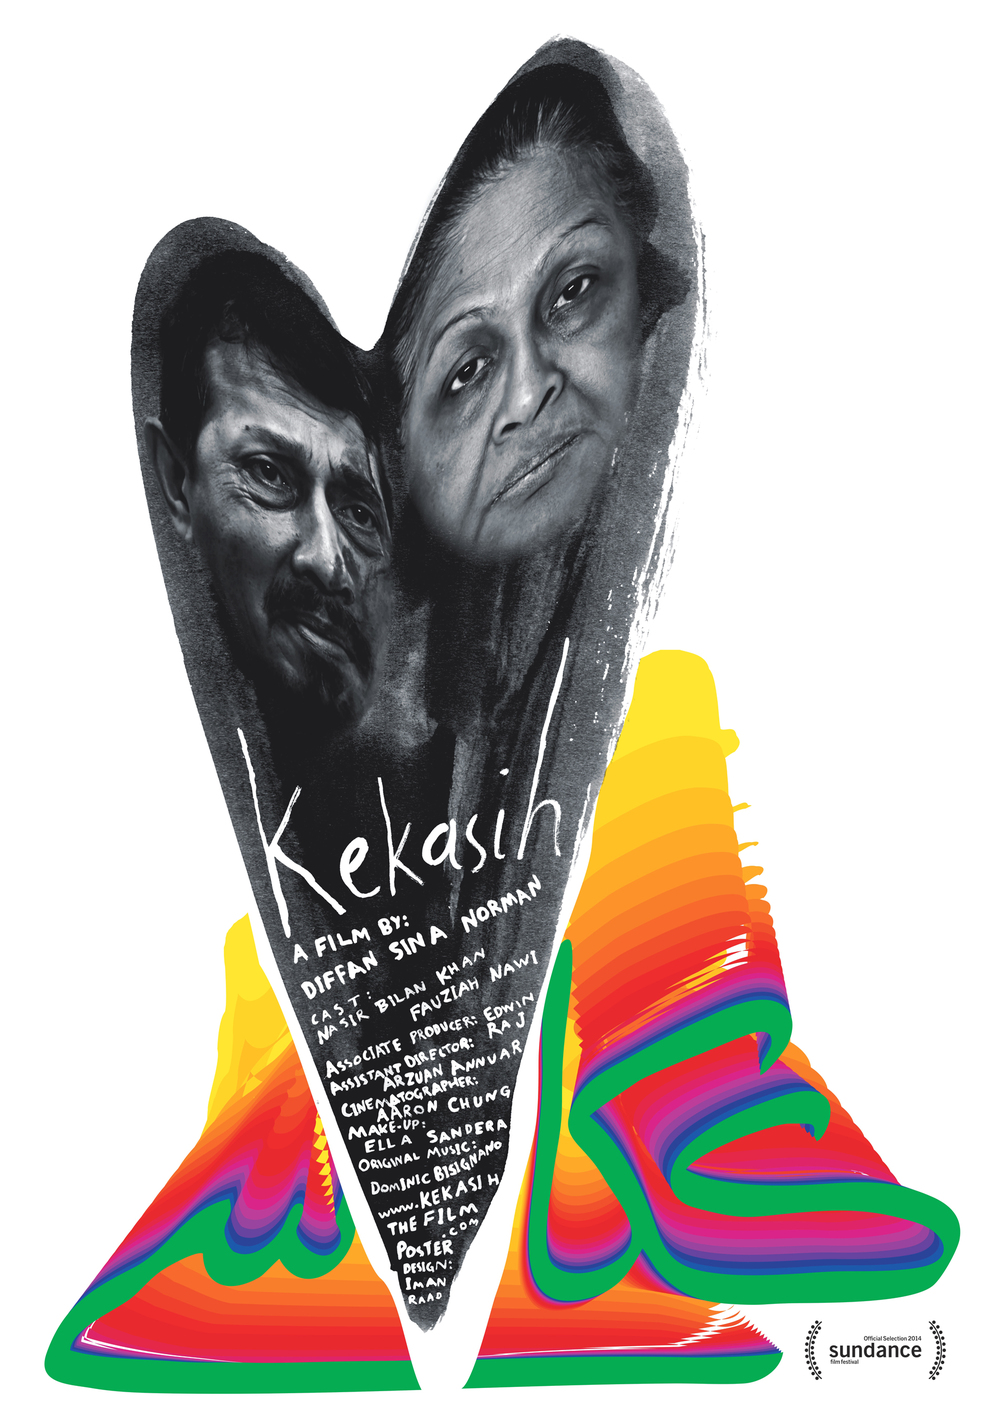 Kekasih poster by  Iman Raad .